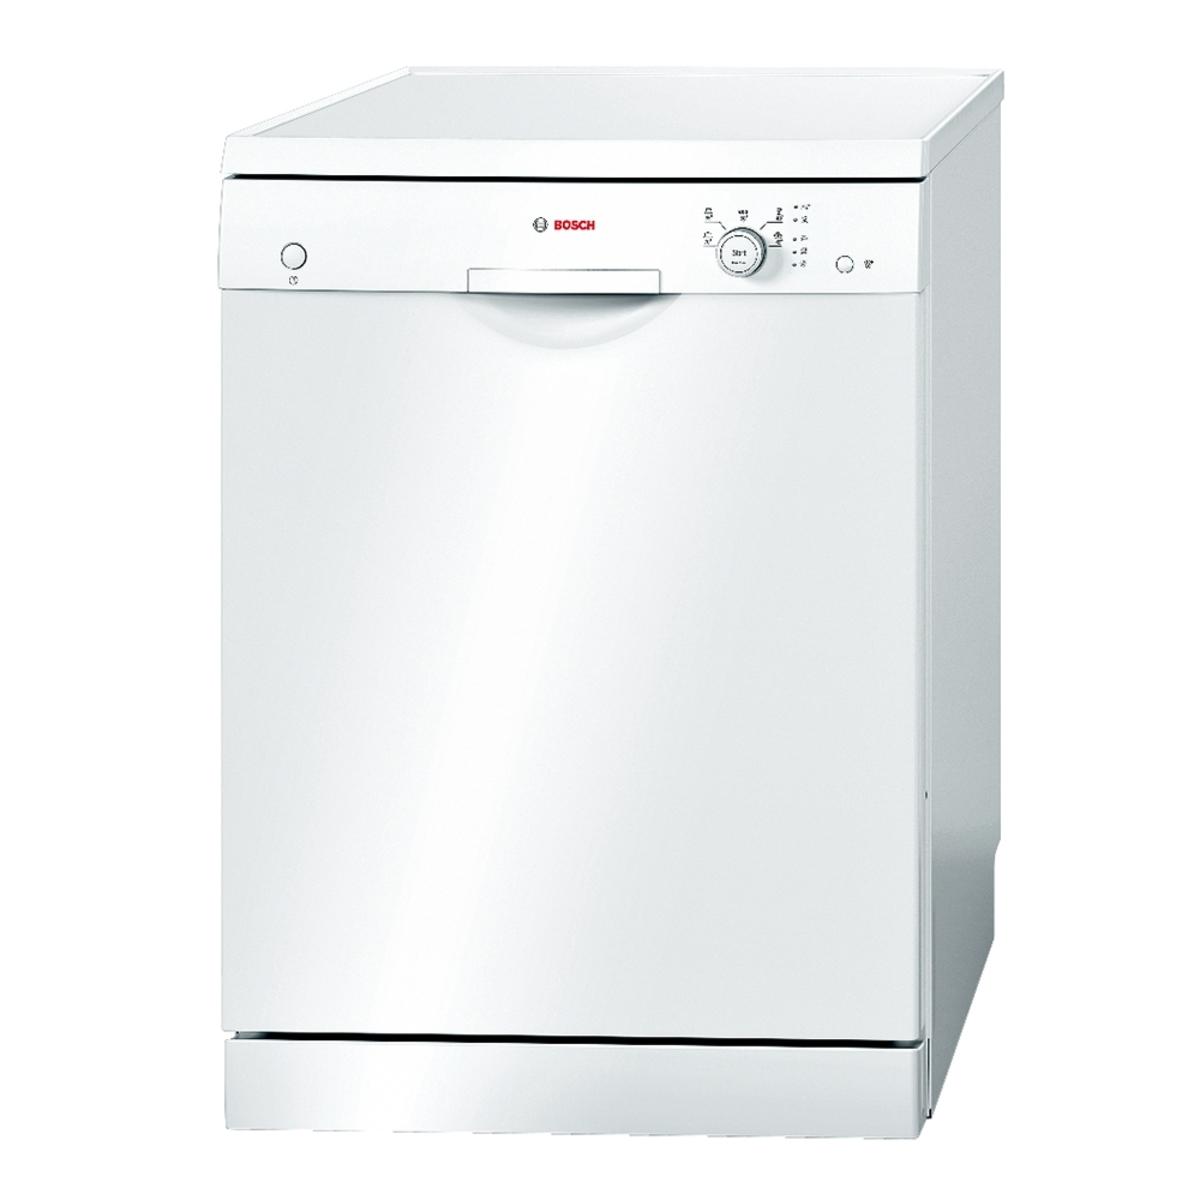 BOSCH 12人份獨立式洗碗機 SMS53D02TC